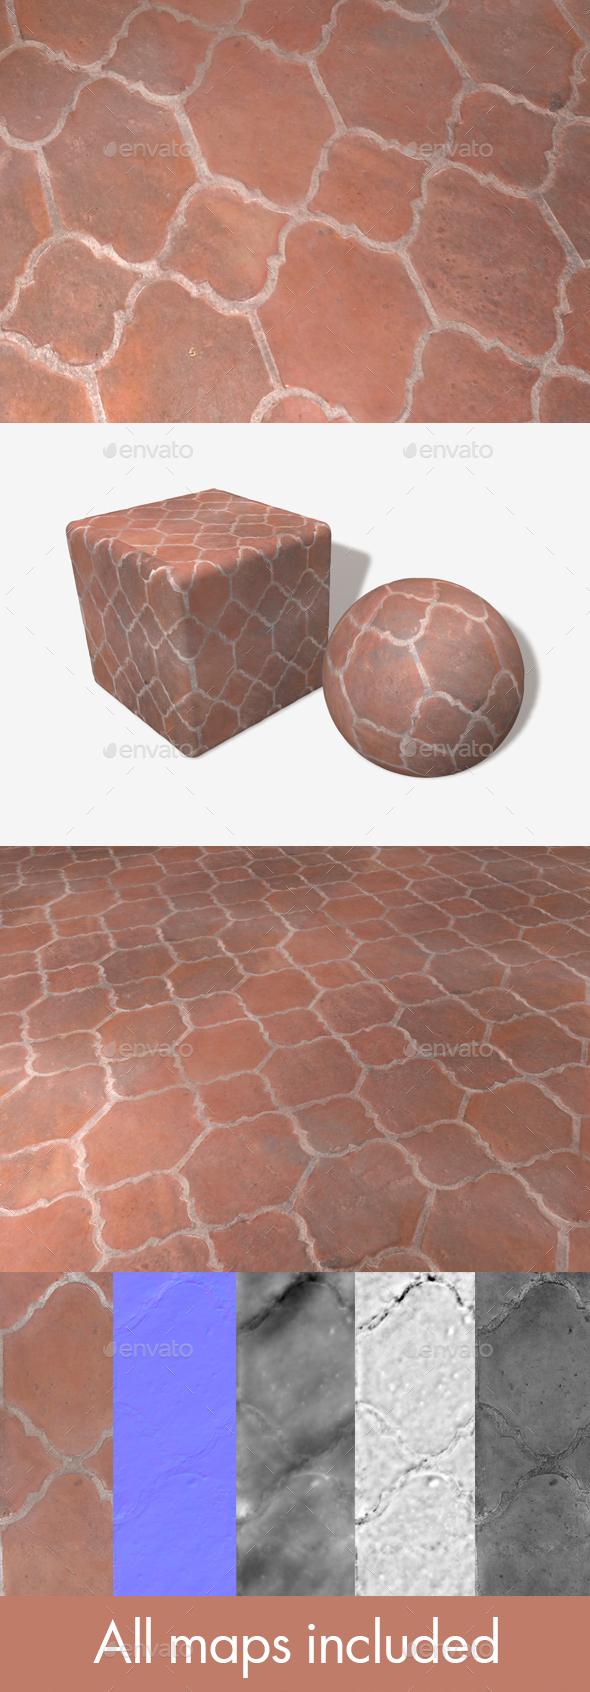 Fancy Terracotta Floor Tiles Seamless Texture - 3DOcean Item for Sale